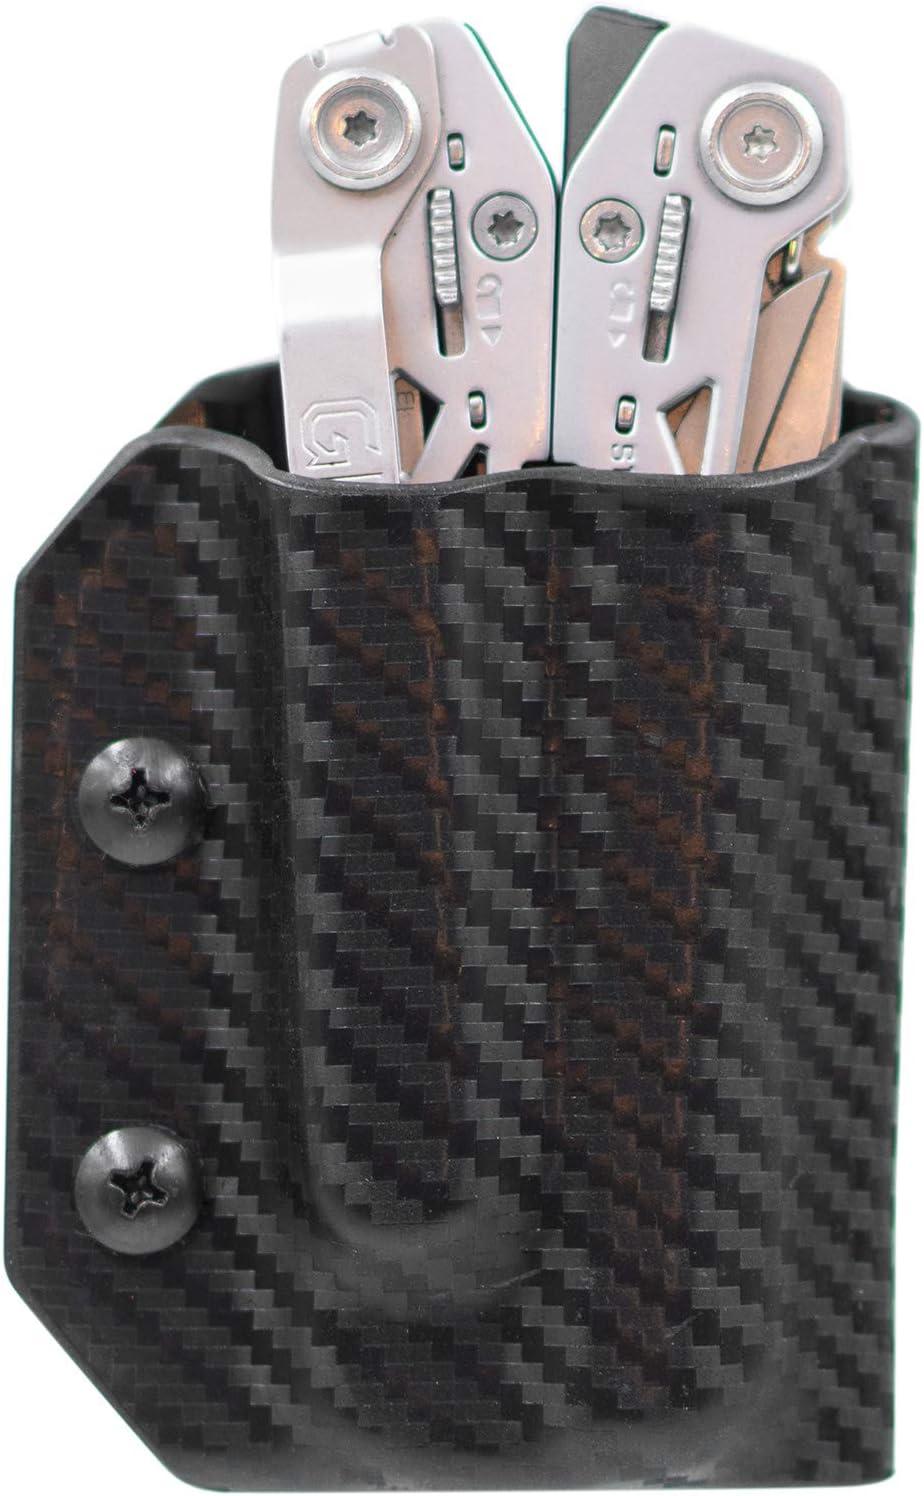 Kydex Multitool Sheath for Gerber SUSPENSION NXT – Made in USA – Multi Tool Sheath Holder Cover Belt Pocket Holster – Multi-tool not included Carbon Fiber Black